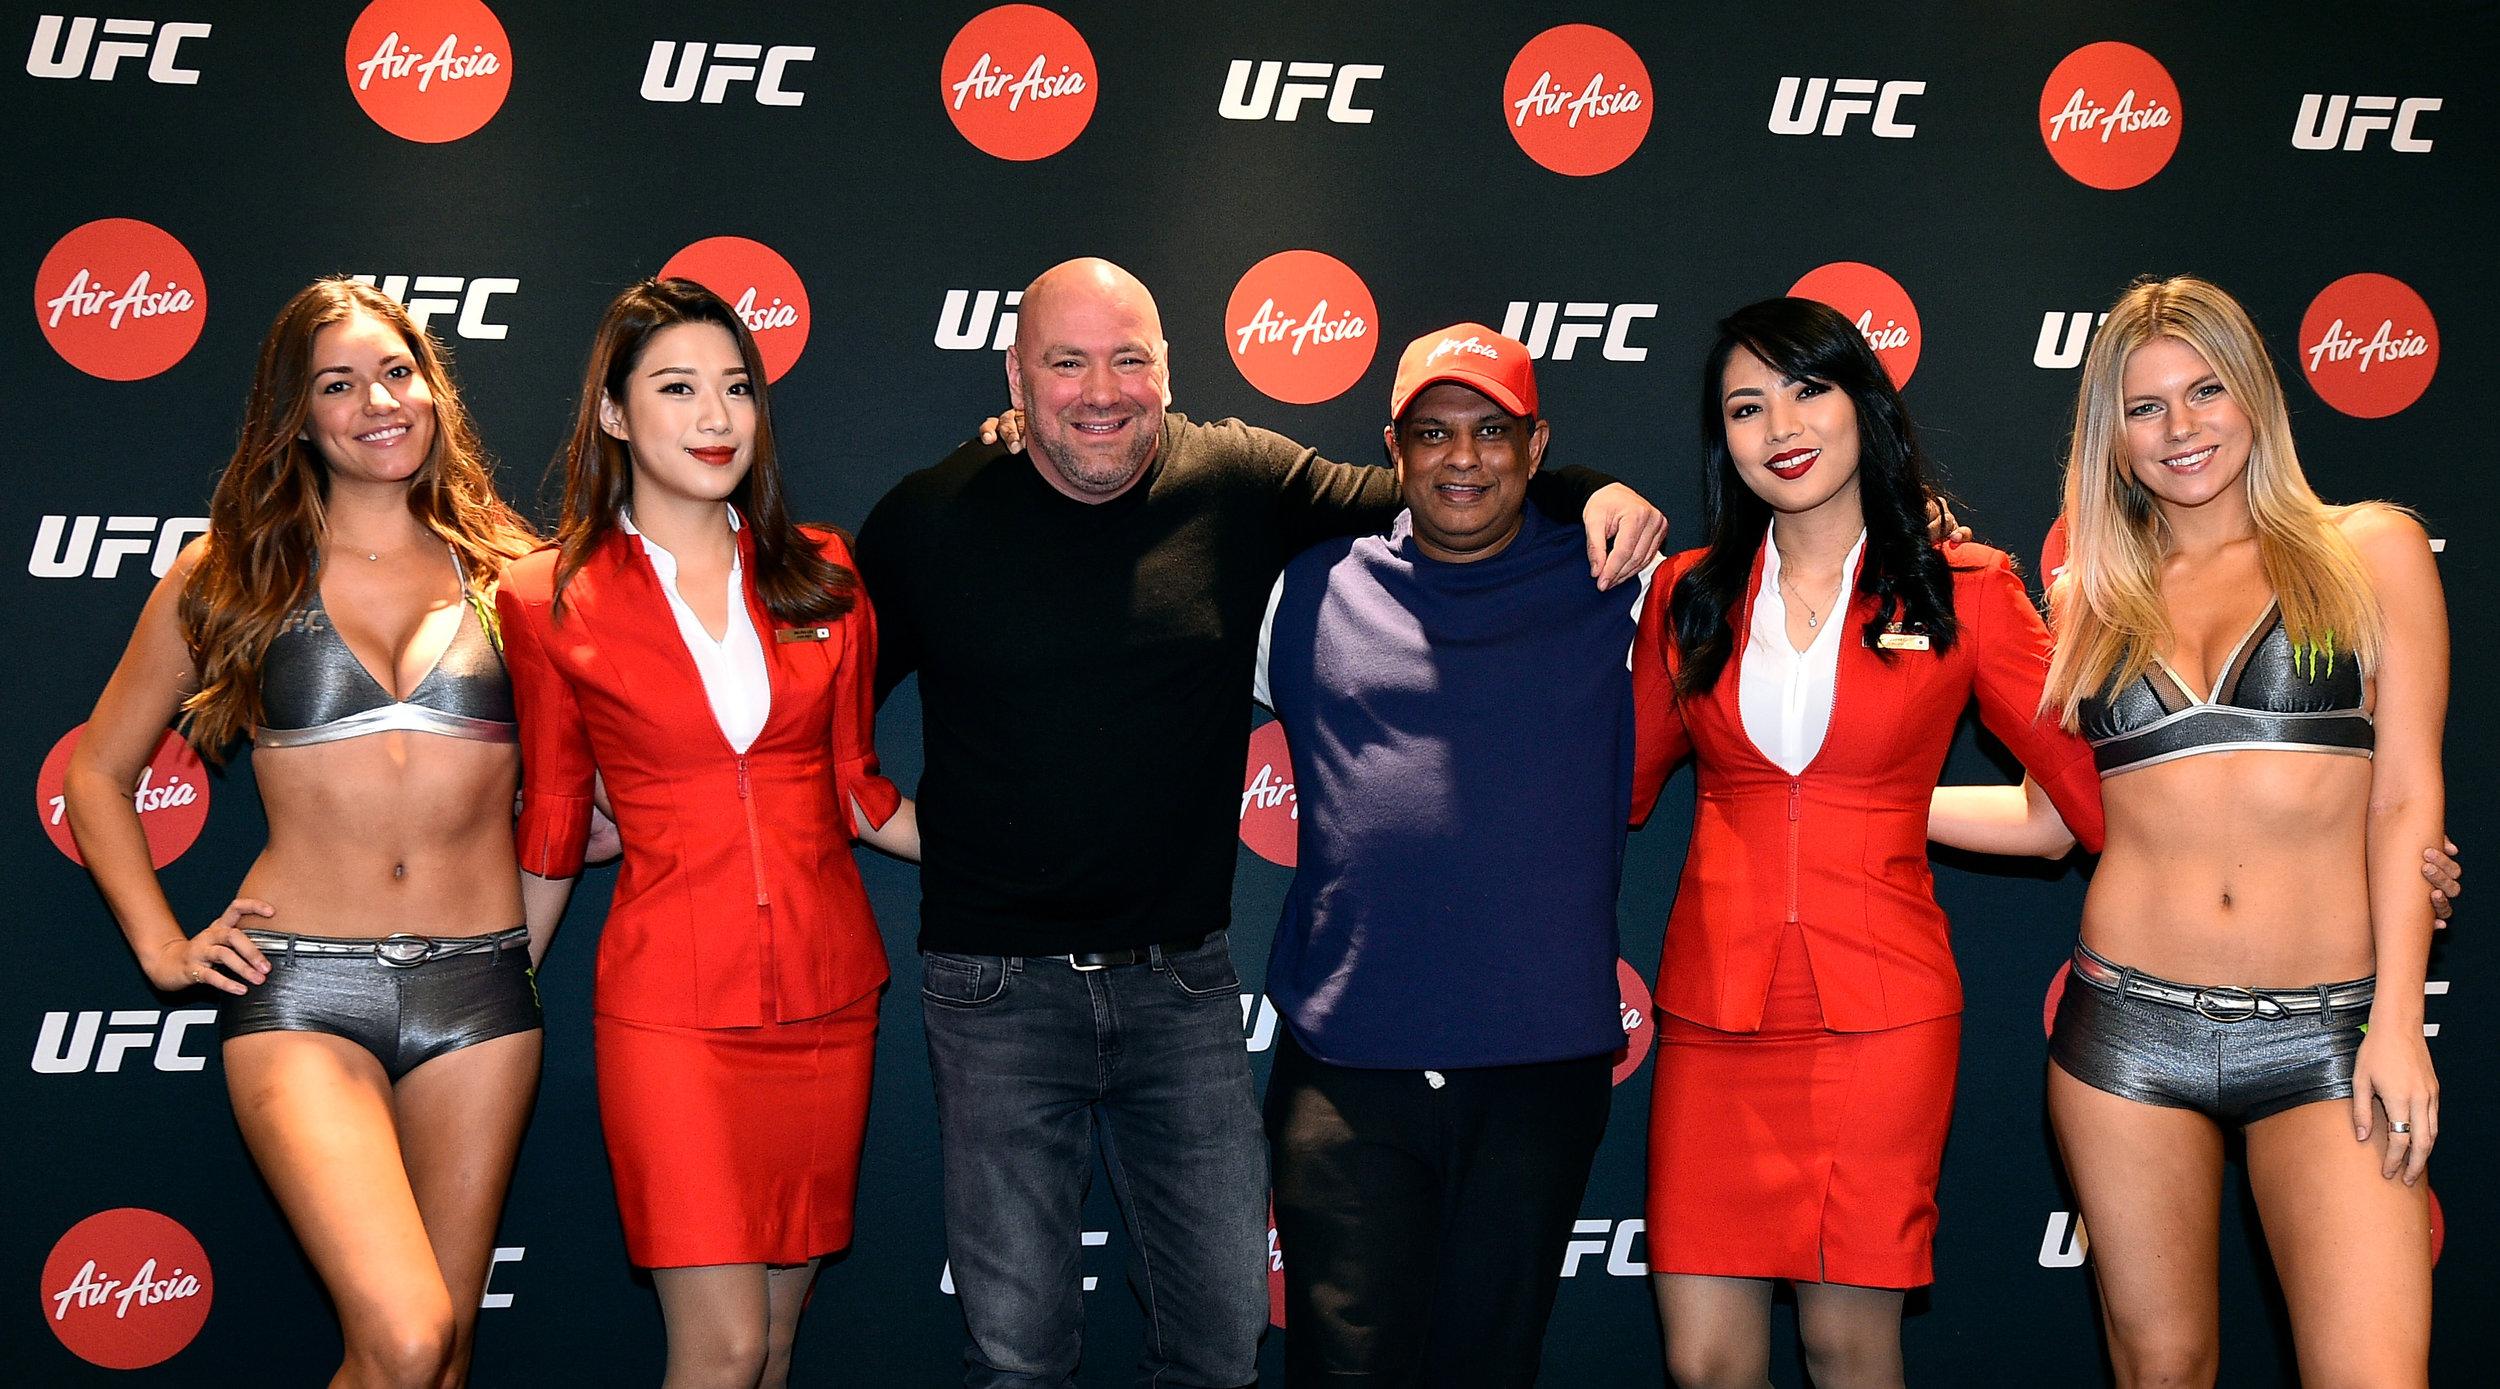 UFC_Air_Asia